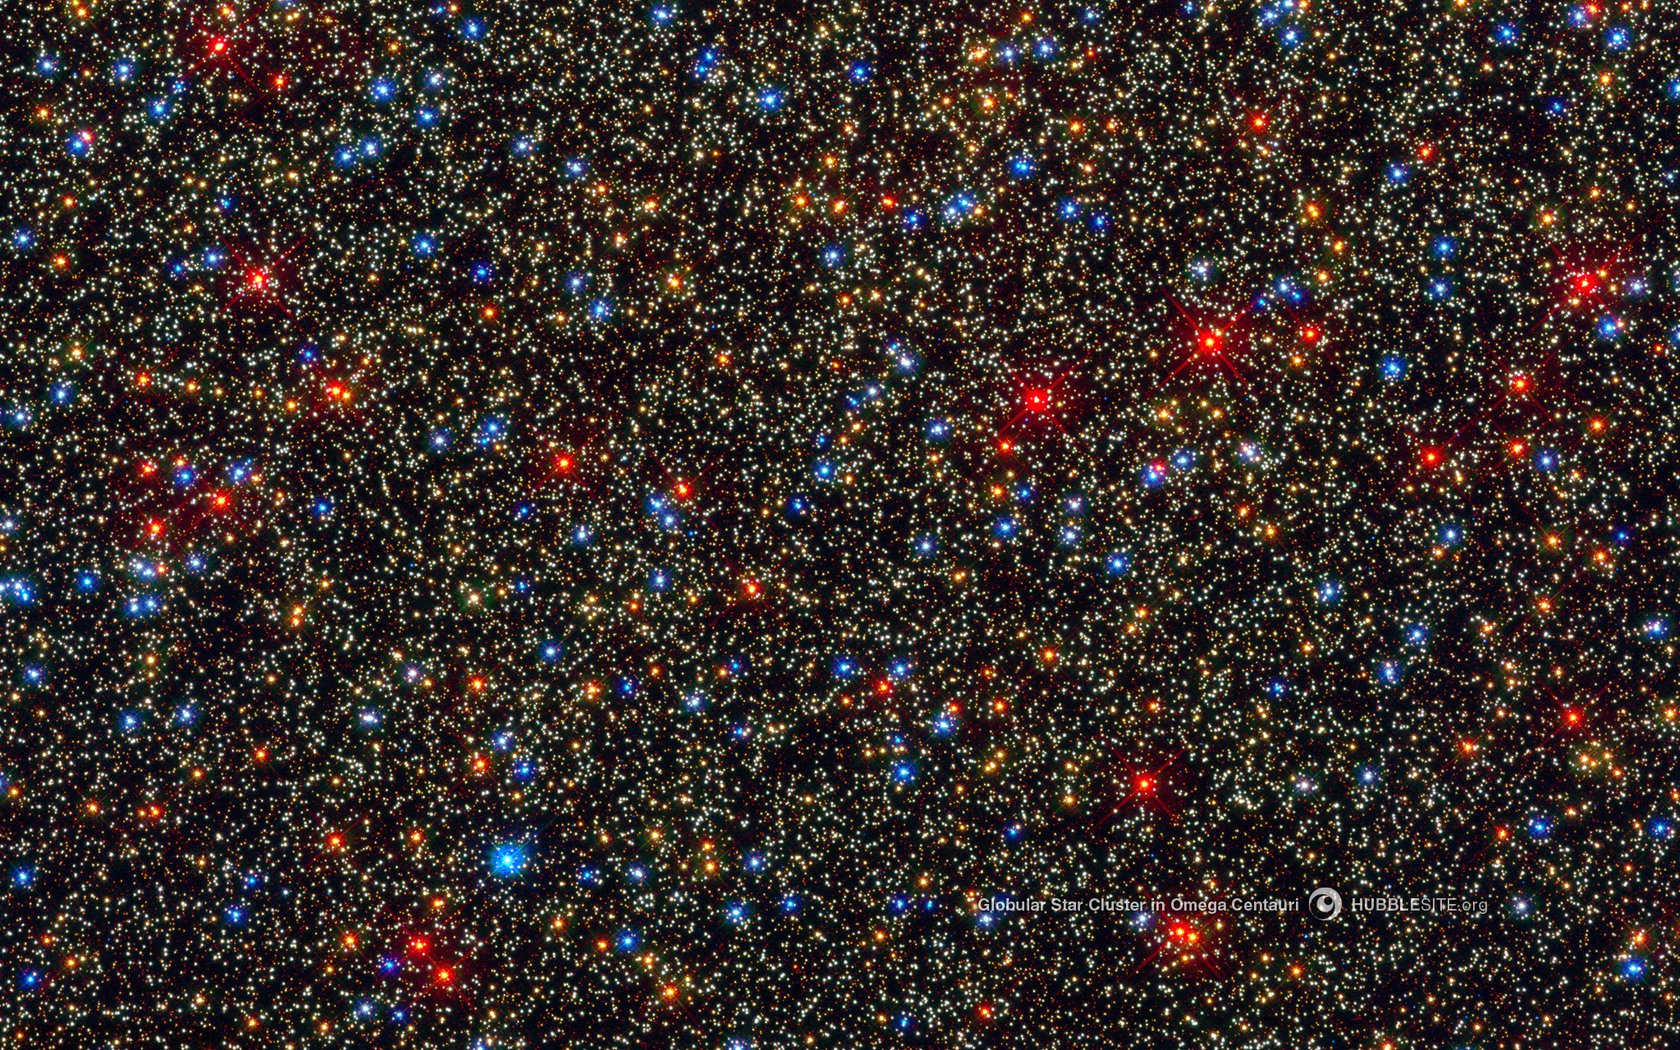 Space nasa hubble globular star cluster omega centauri ...